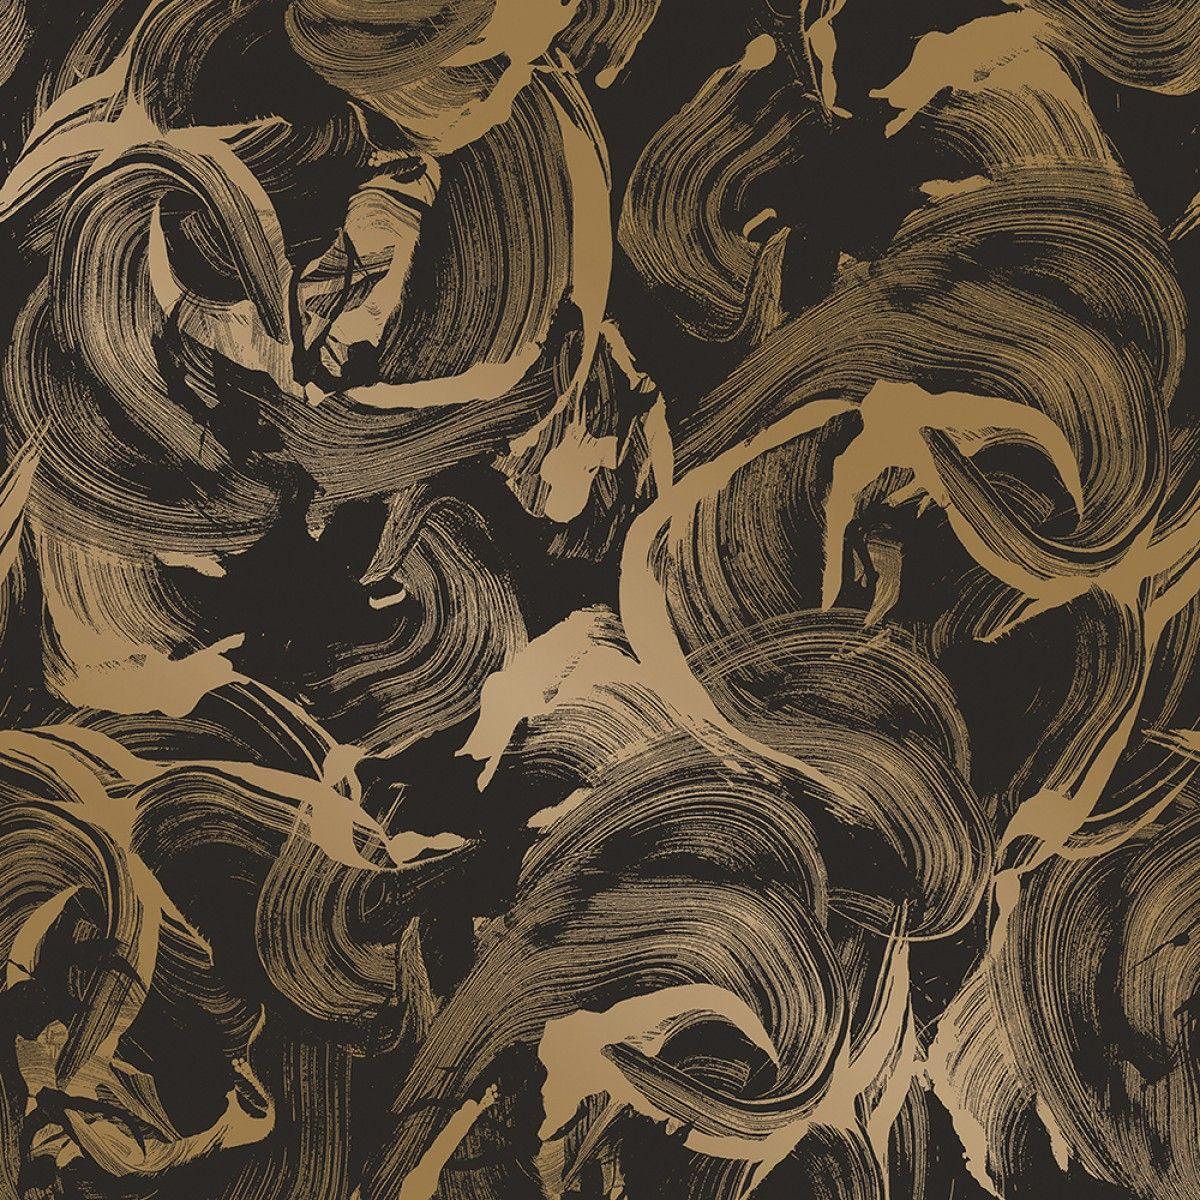 L Amour Matte Black Gold Gold Metallic Wallpaper Gold